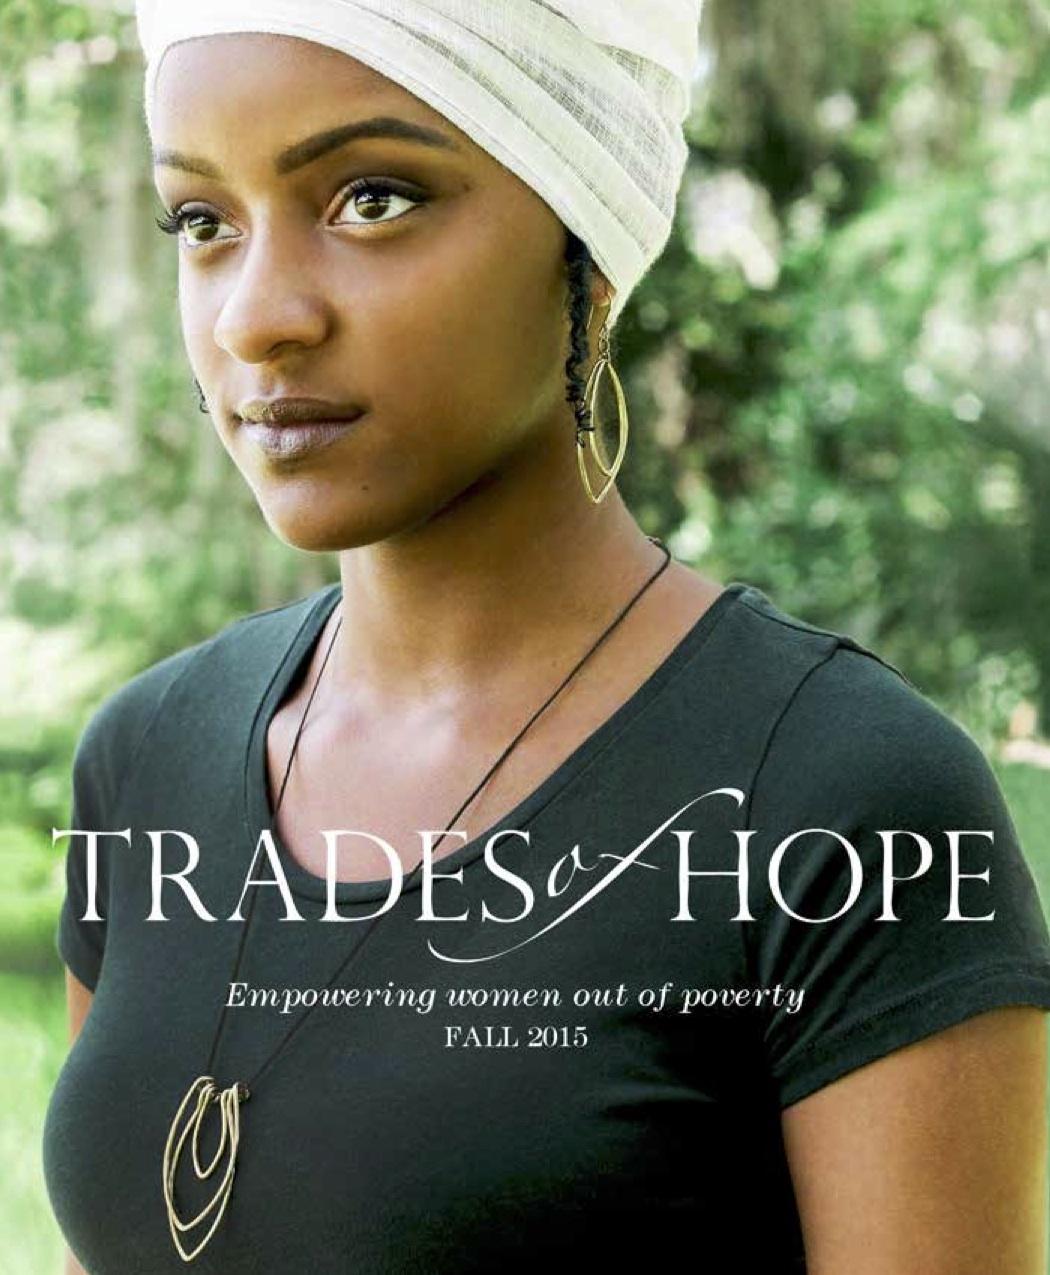 Trades of Hope catalog, Fall 2015